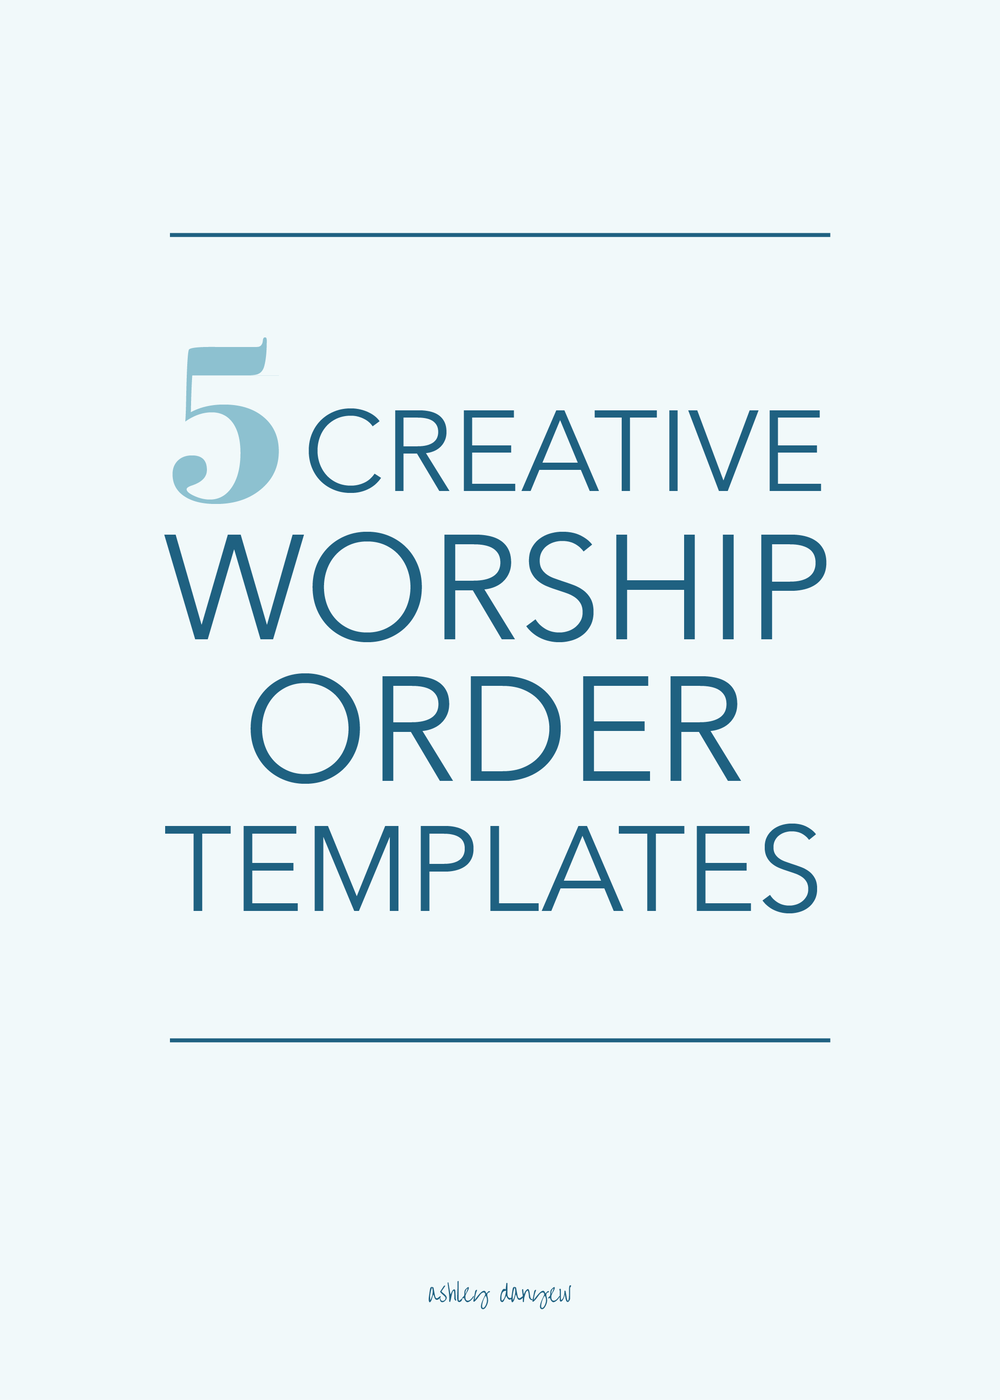 Copy of 5 Creative Worship Order Templates